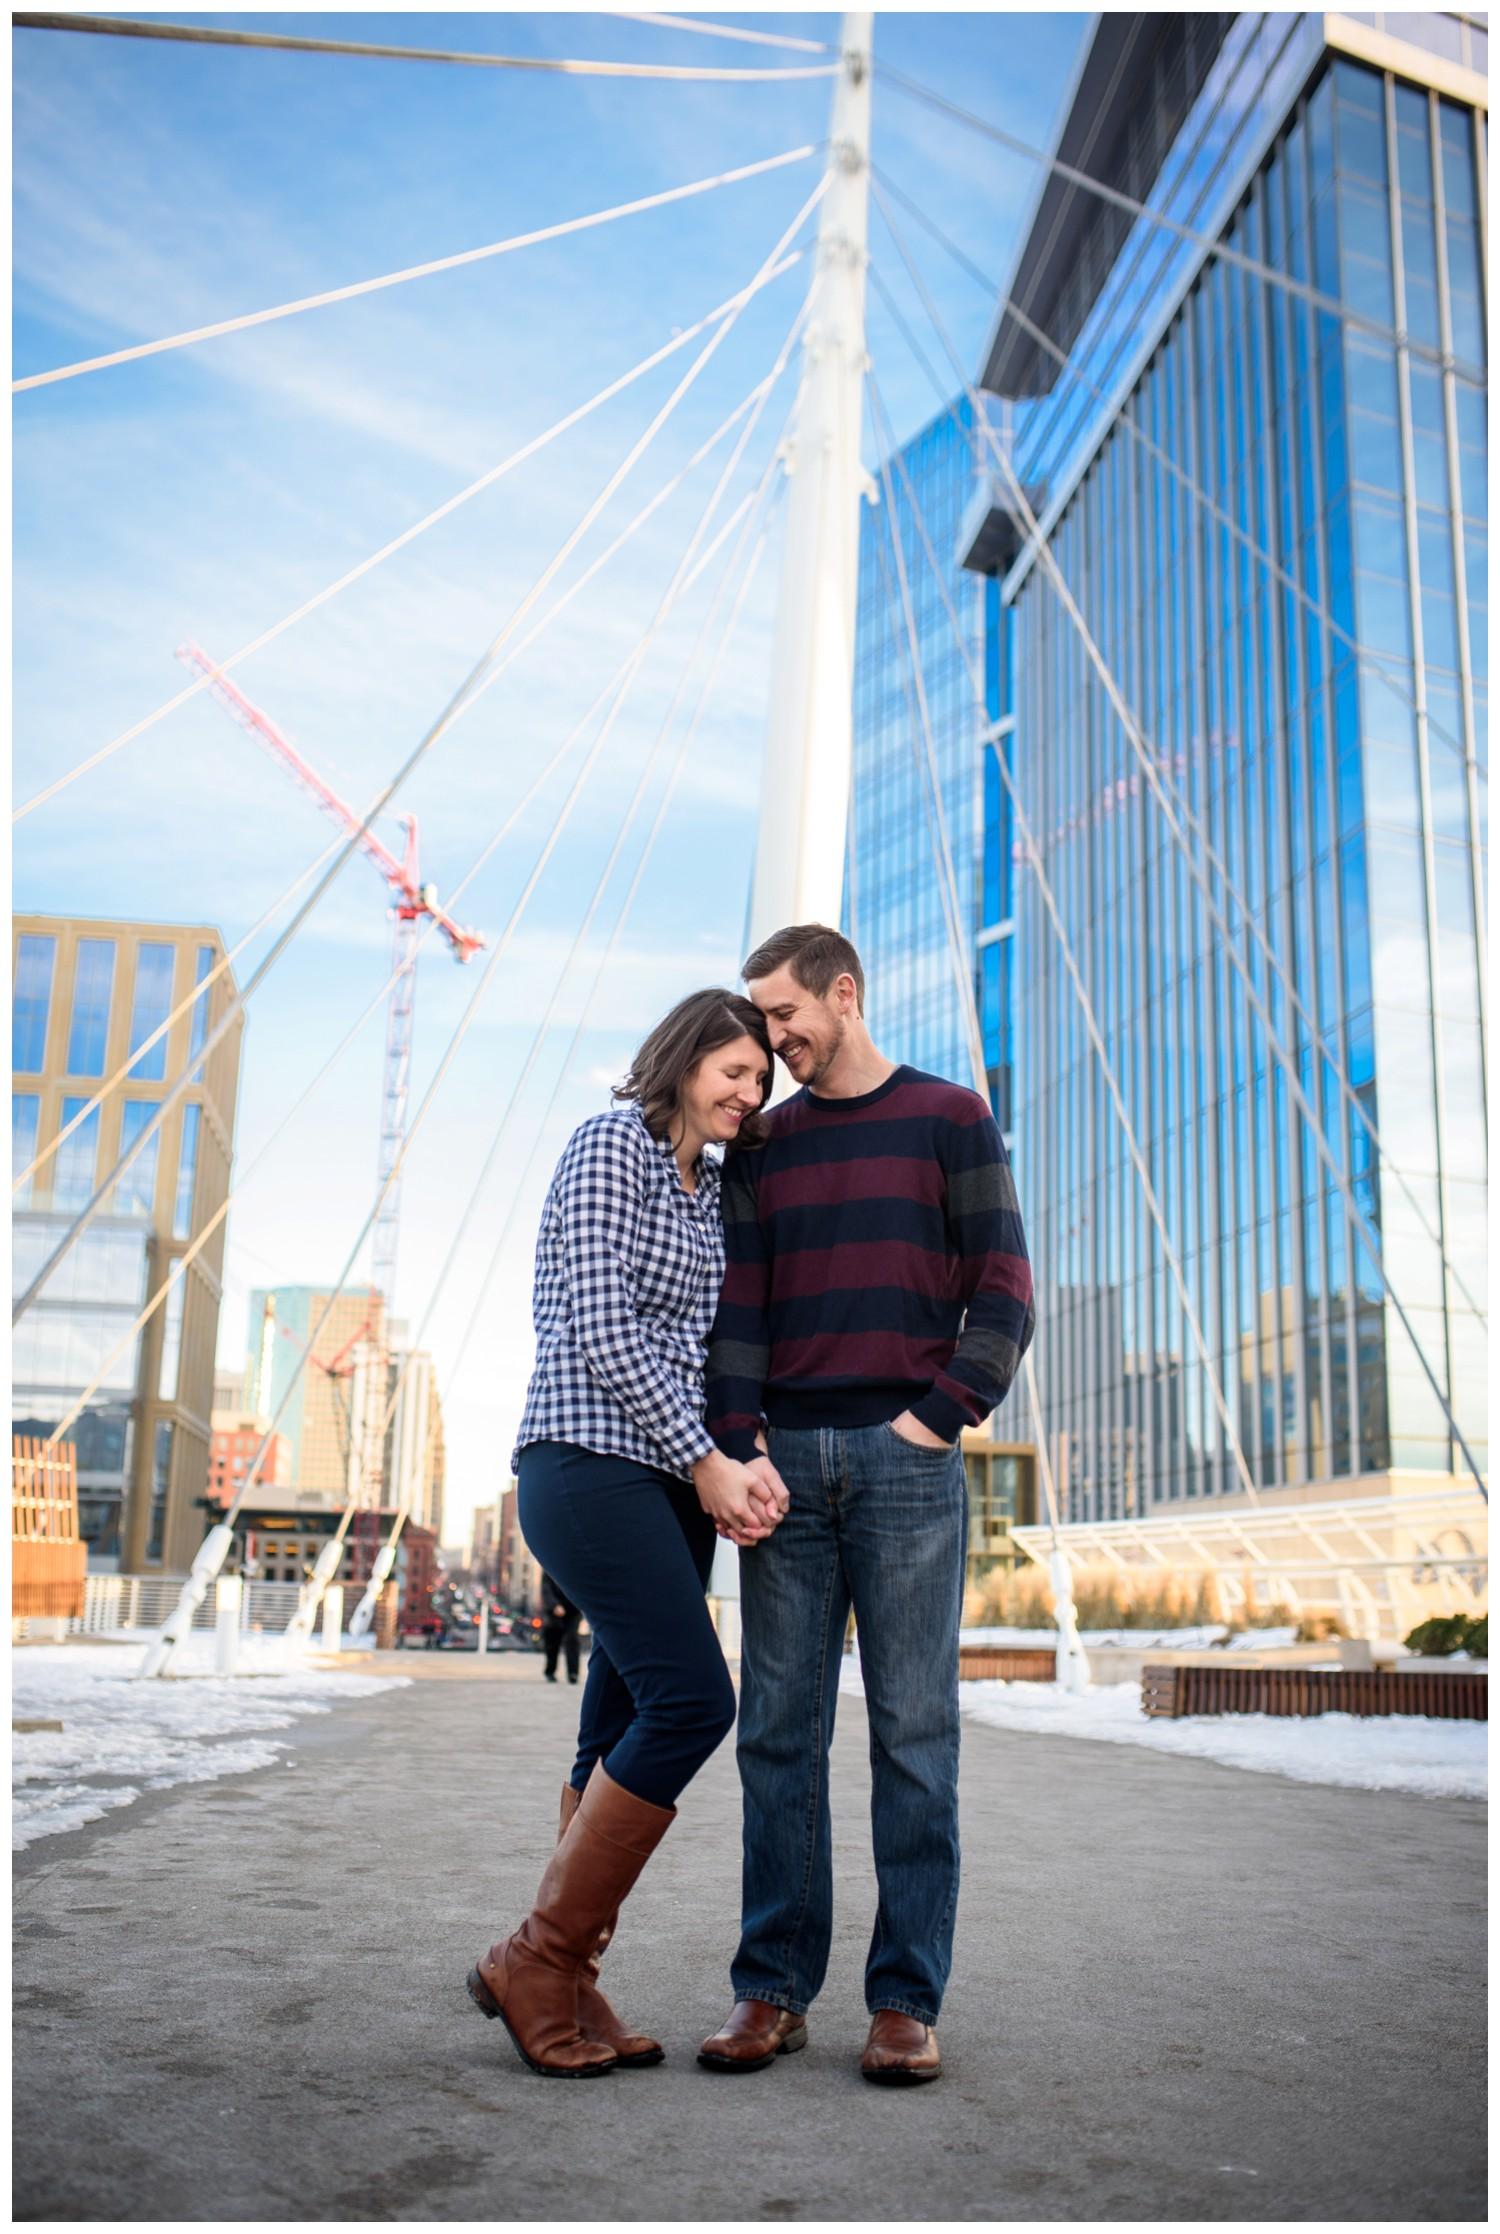 Downtown-Denver-Winter-Engagement-photography_0033.jpg